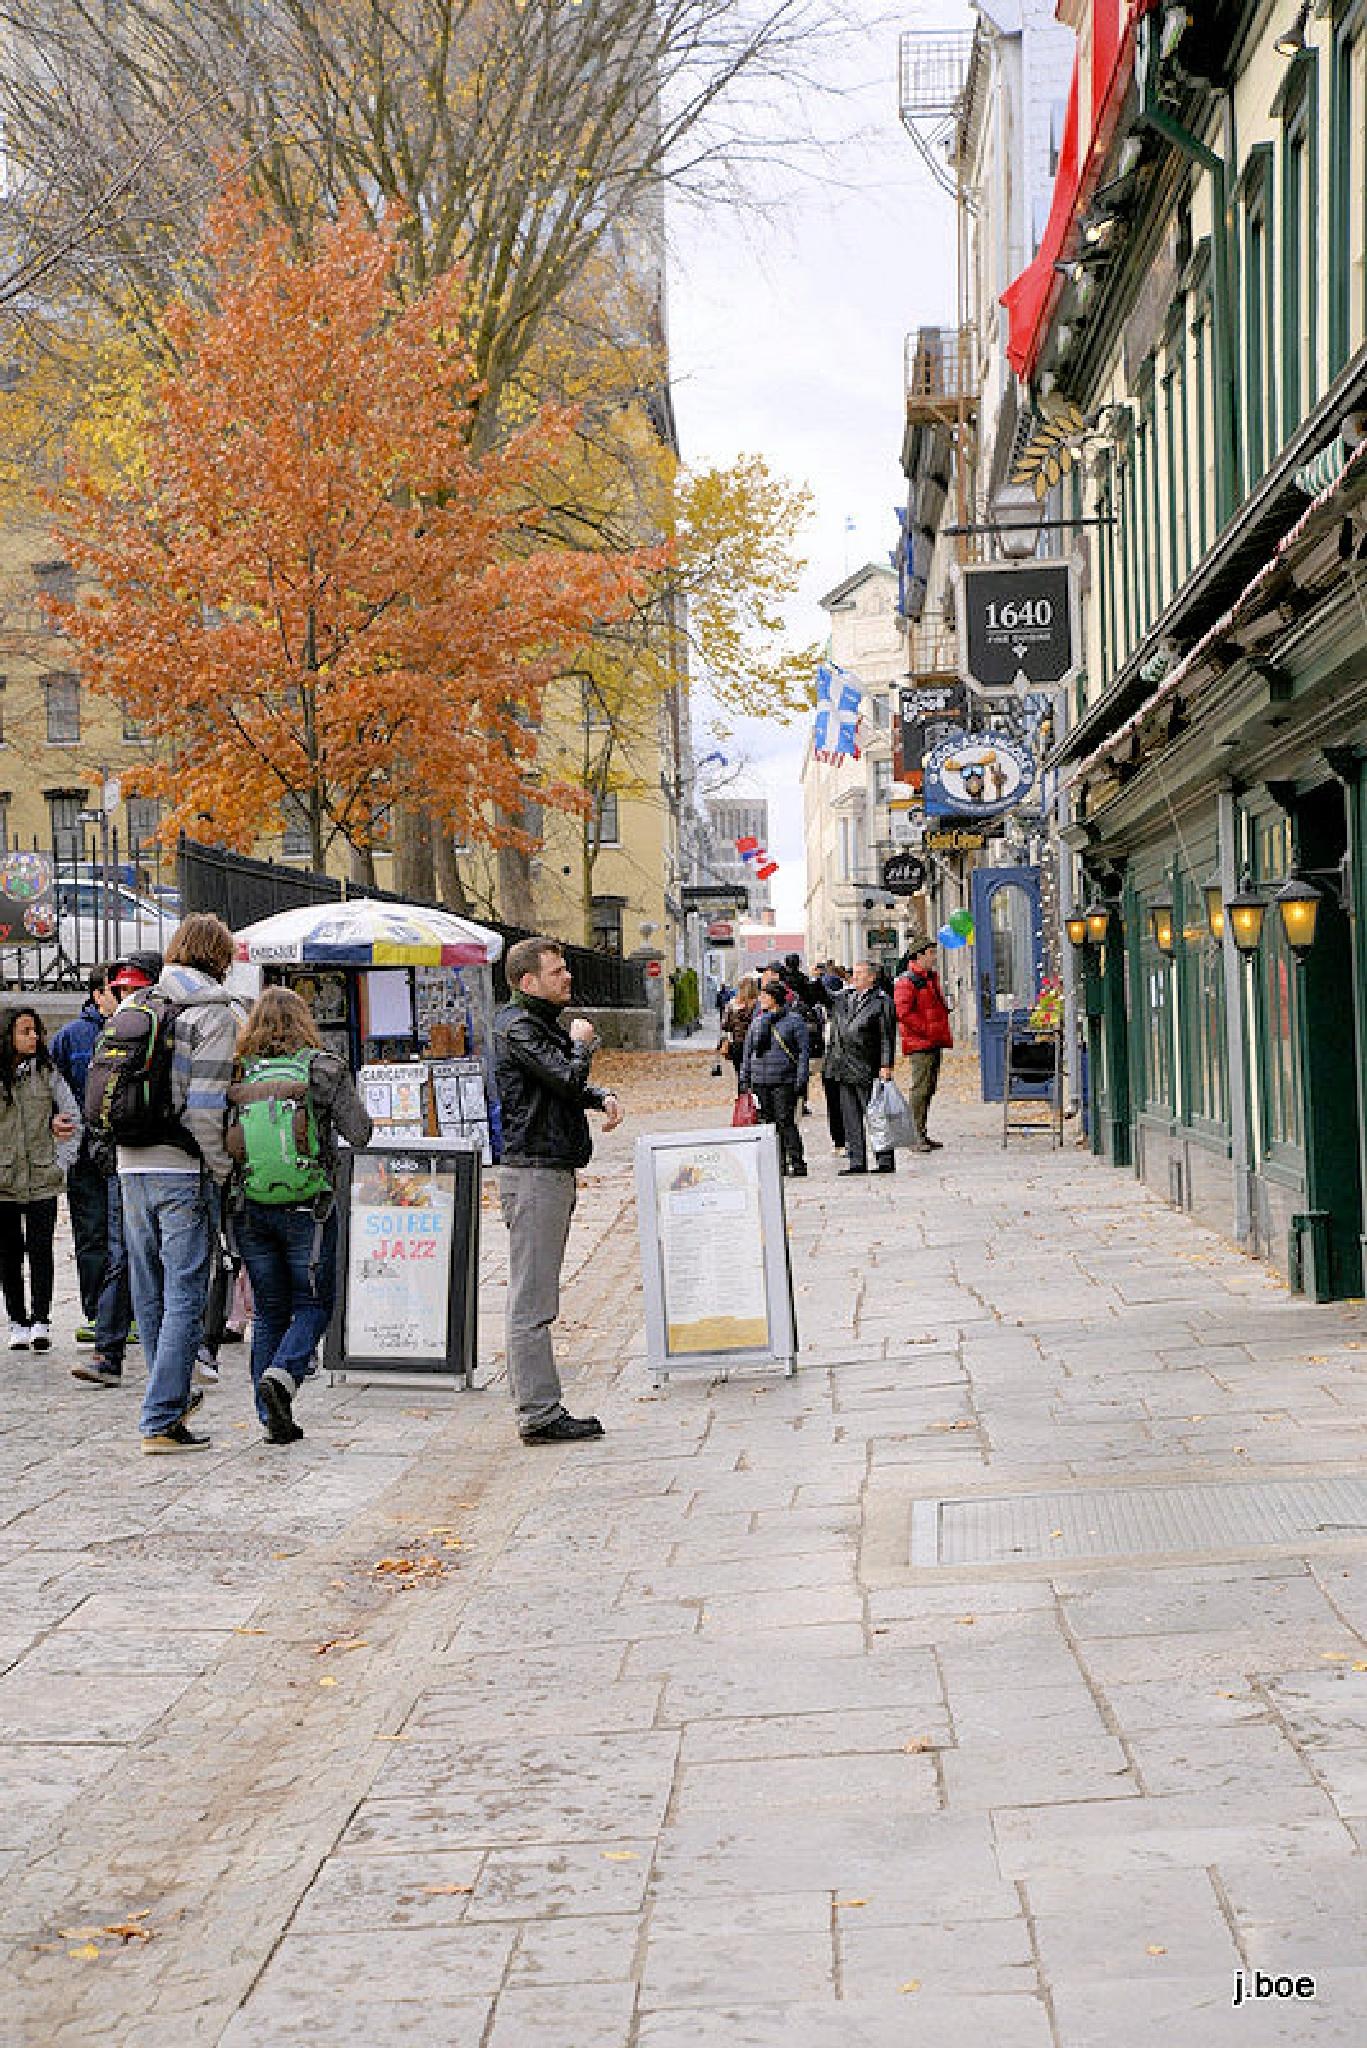 2015.11.07 - Street in Old Quebec by j.boe